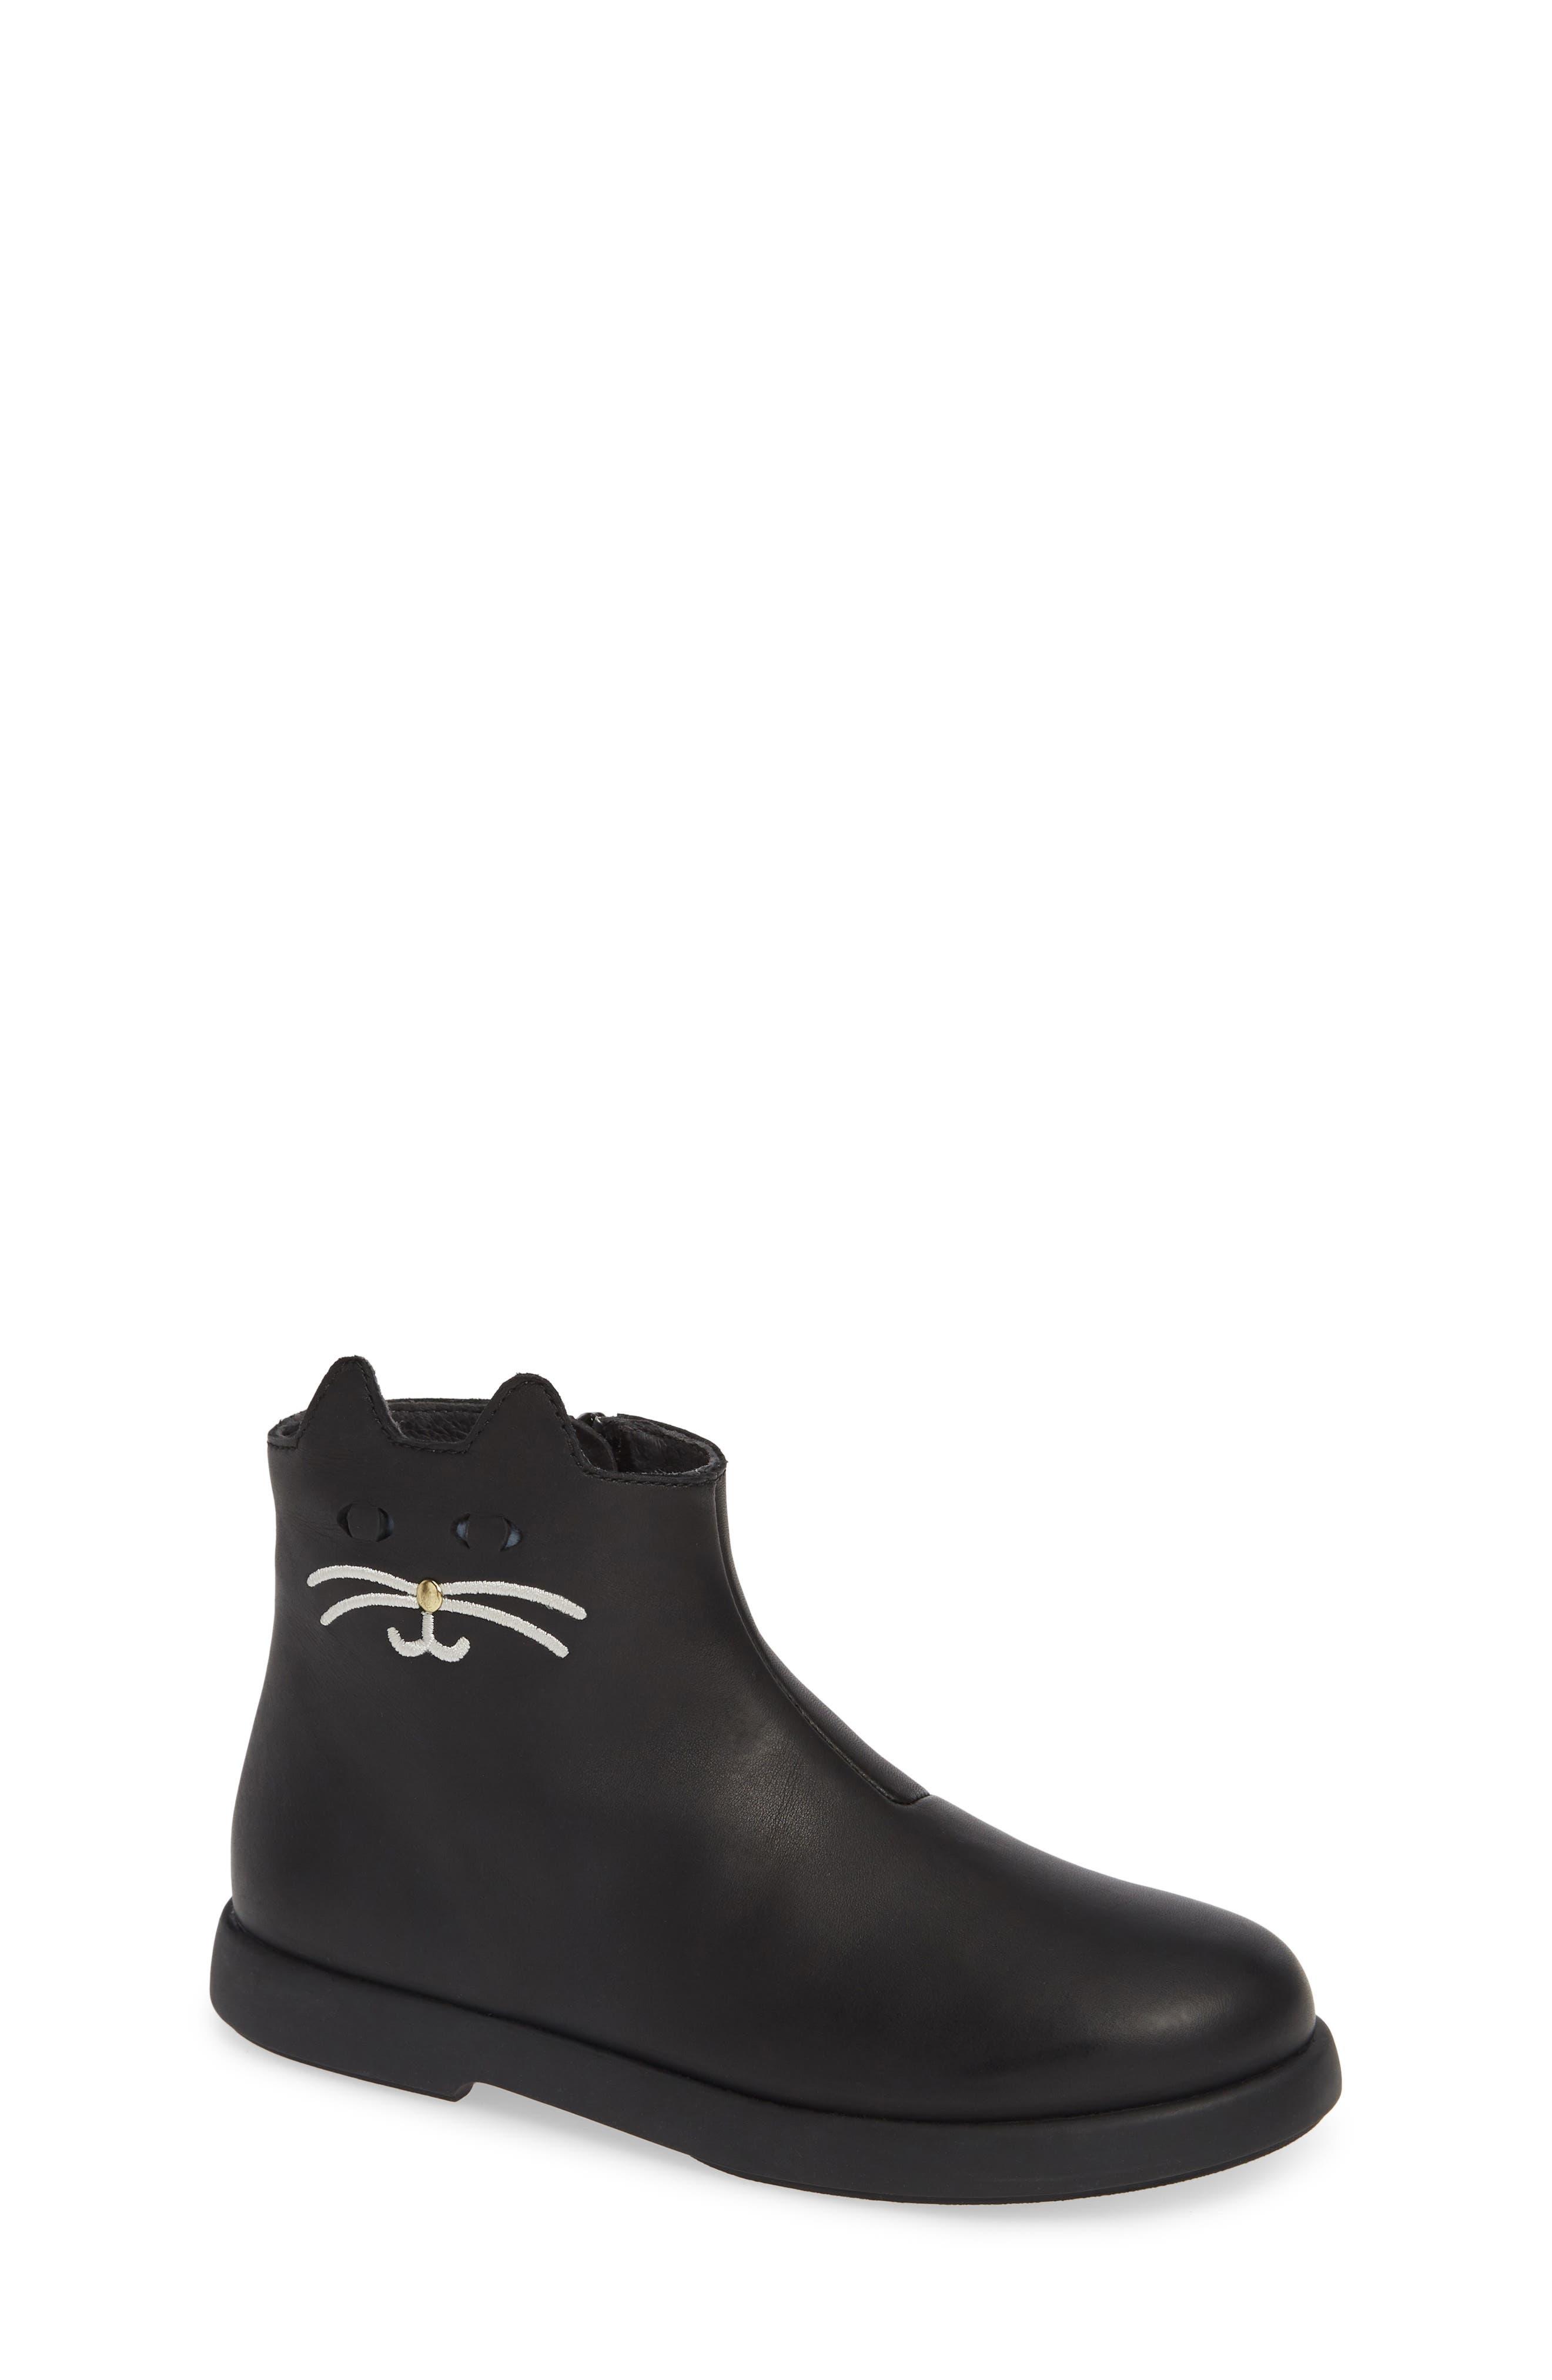 Duet Boot,                             Main thumbnail 1, color,                             BLACK